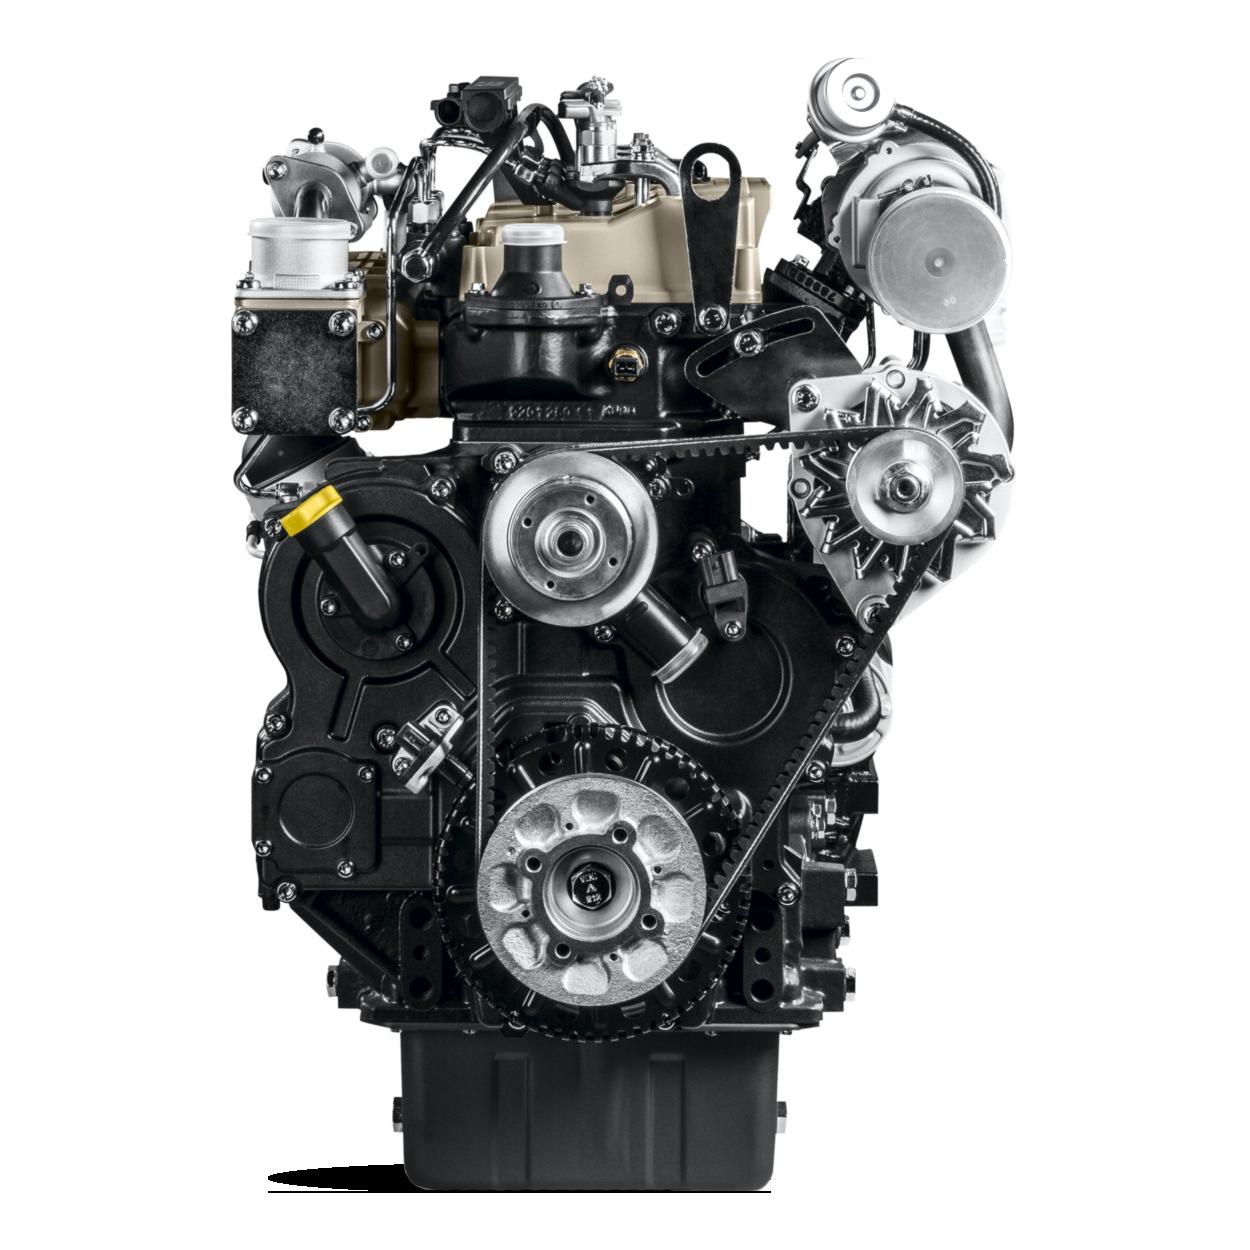 motor-valiant-60